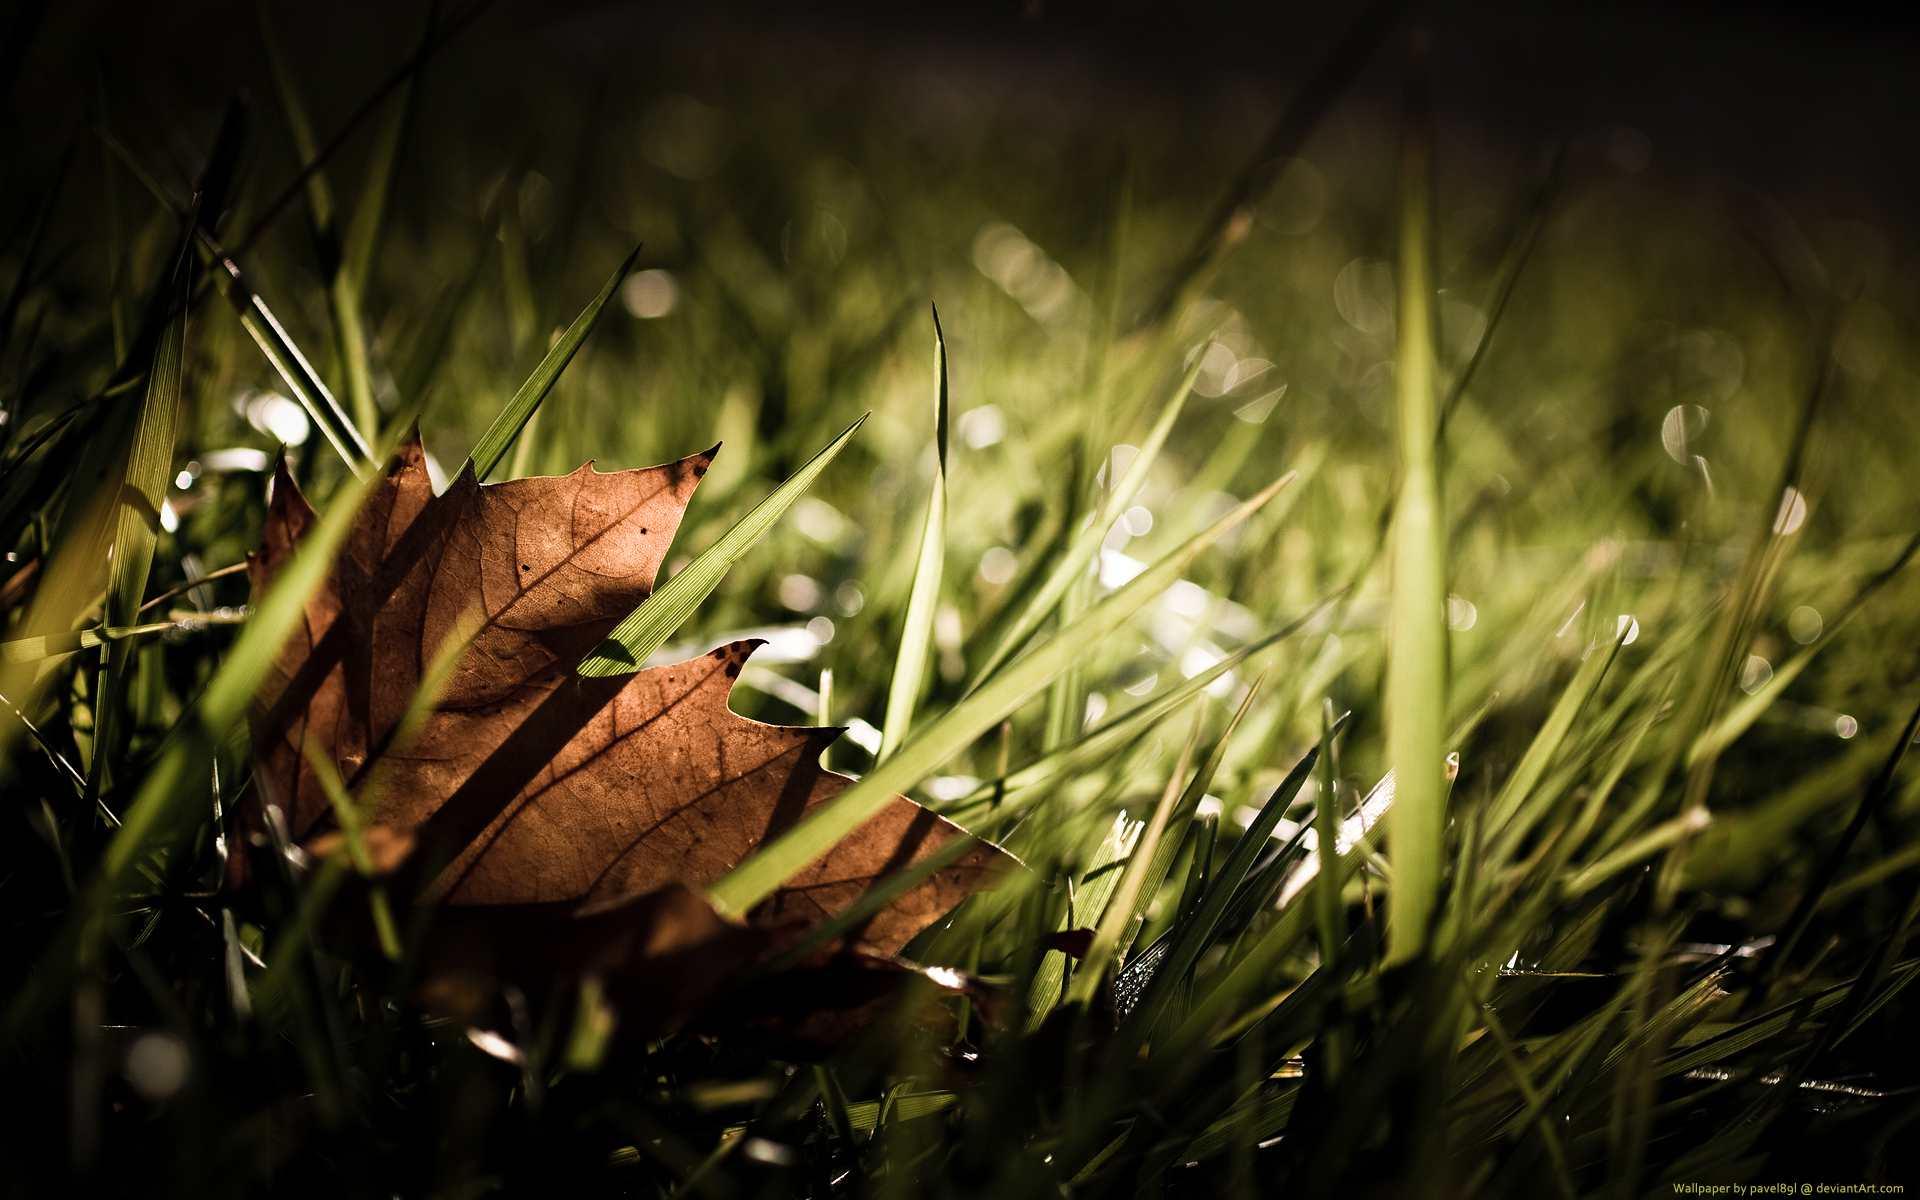 A brown leaf in green grass